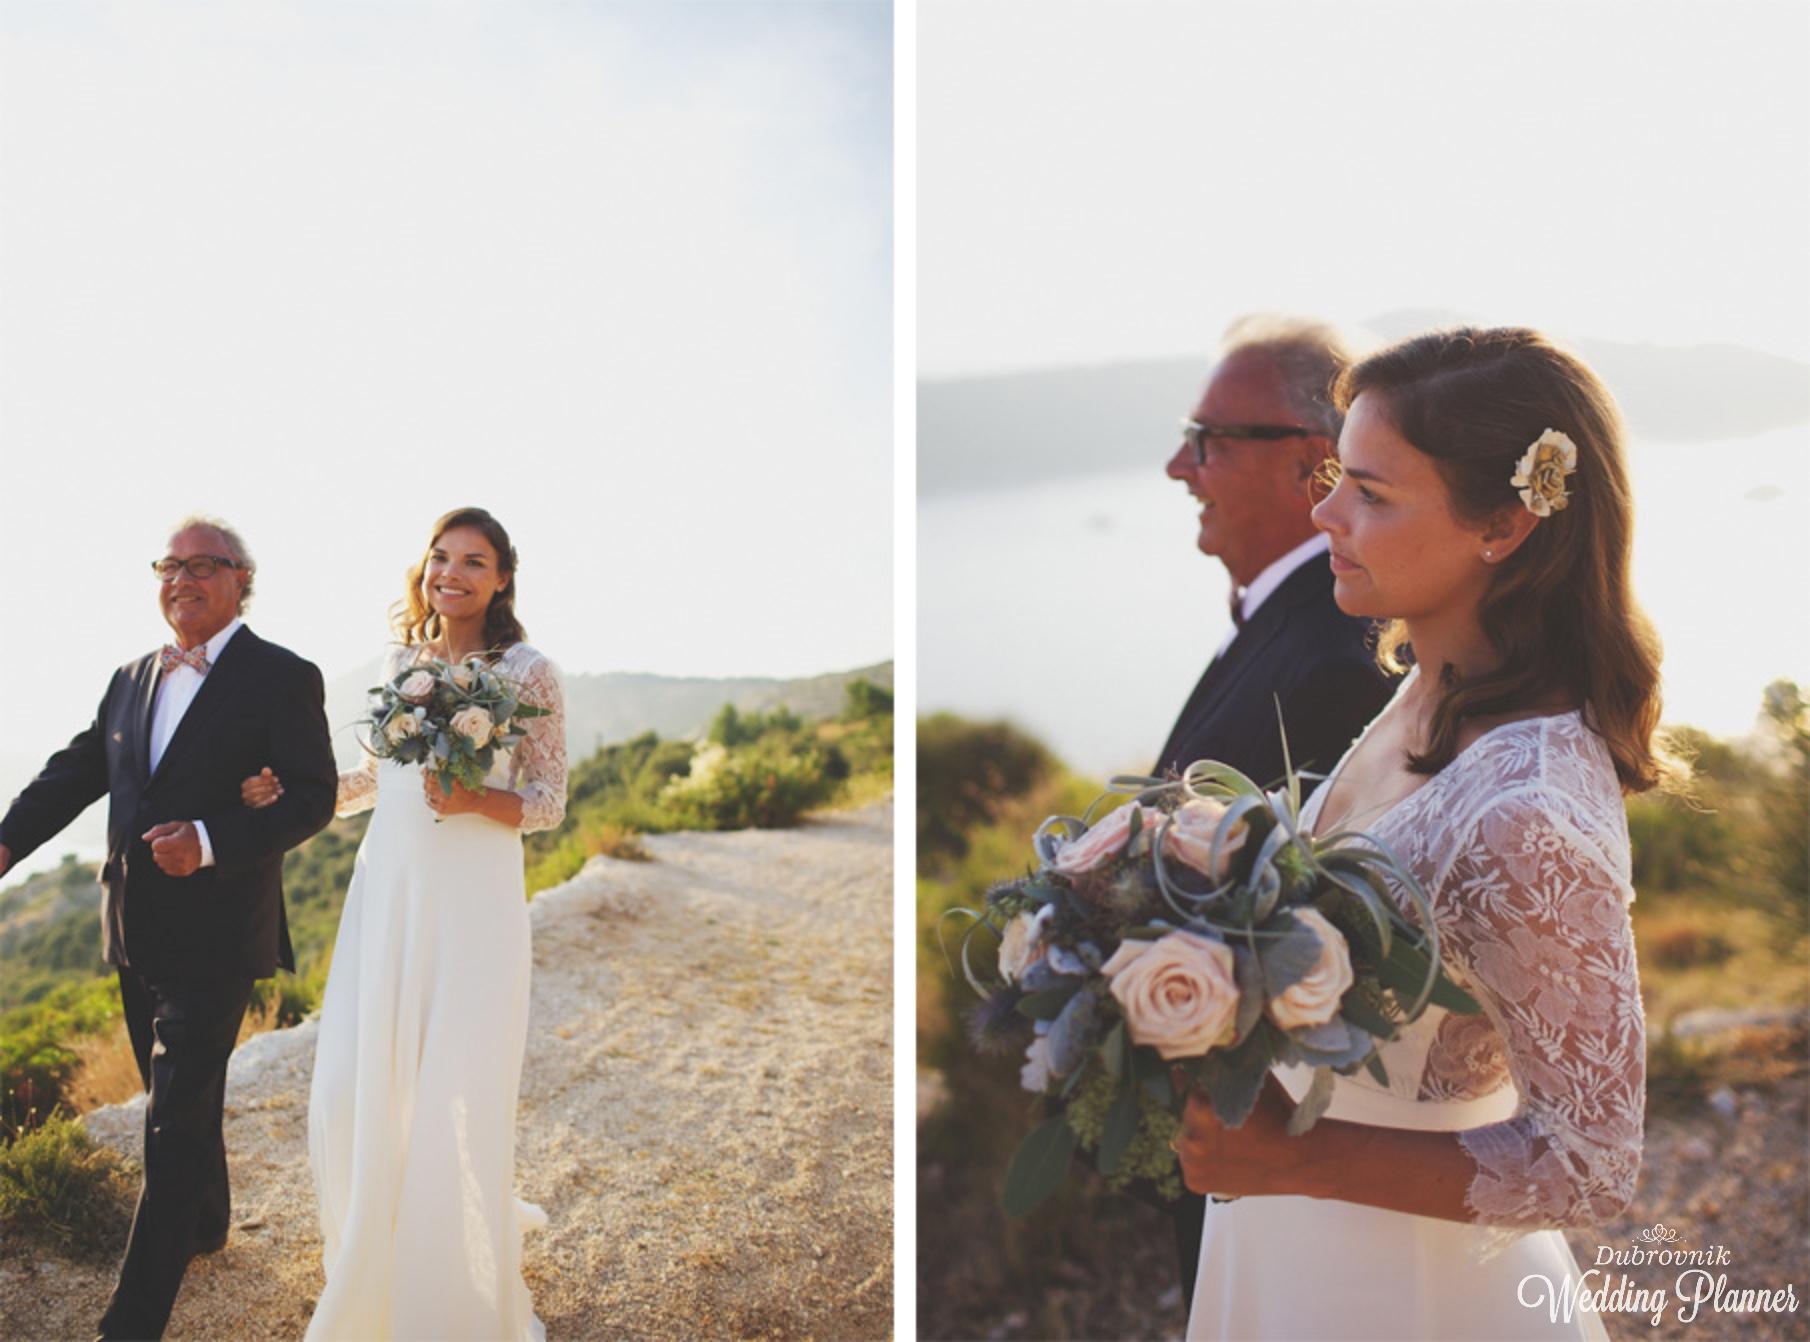 Wedding Decor -       96       Normal  0          false  false  false    EN-GB  X-NONE  X-NONE                                                                                                                                                                                                                                                                                                                                                                                                                                                                                                                                                                                                                                                                                                                                                                                                                                                     /* Style Definitions */ table.MsoNormalTable {mso-style-name: